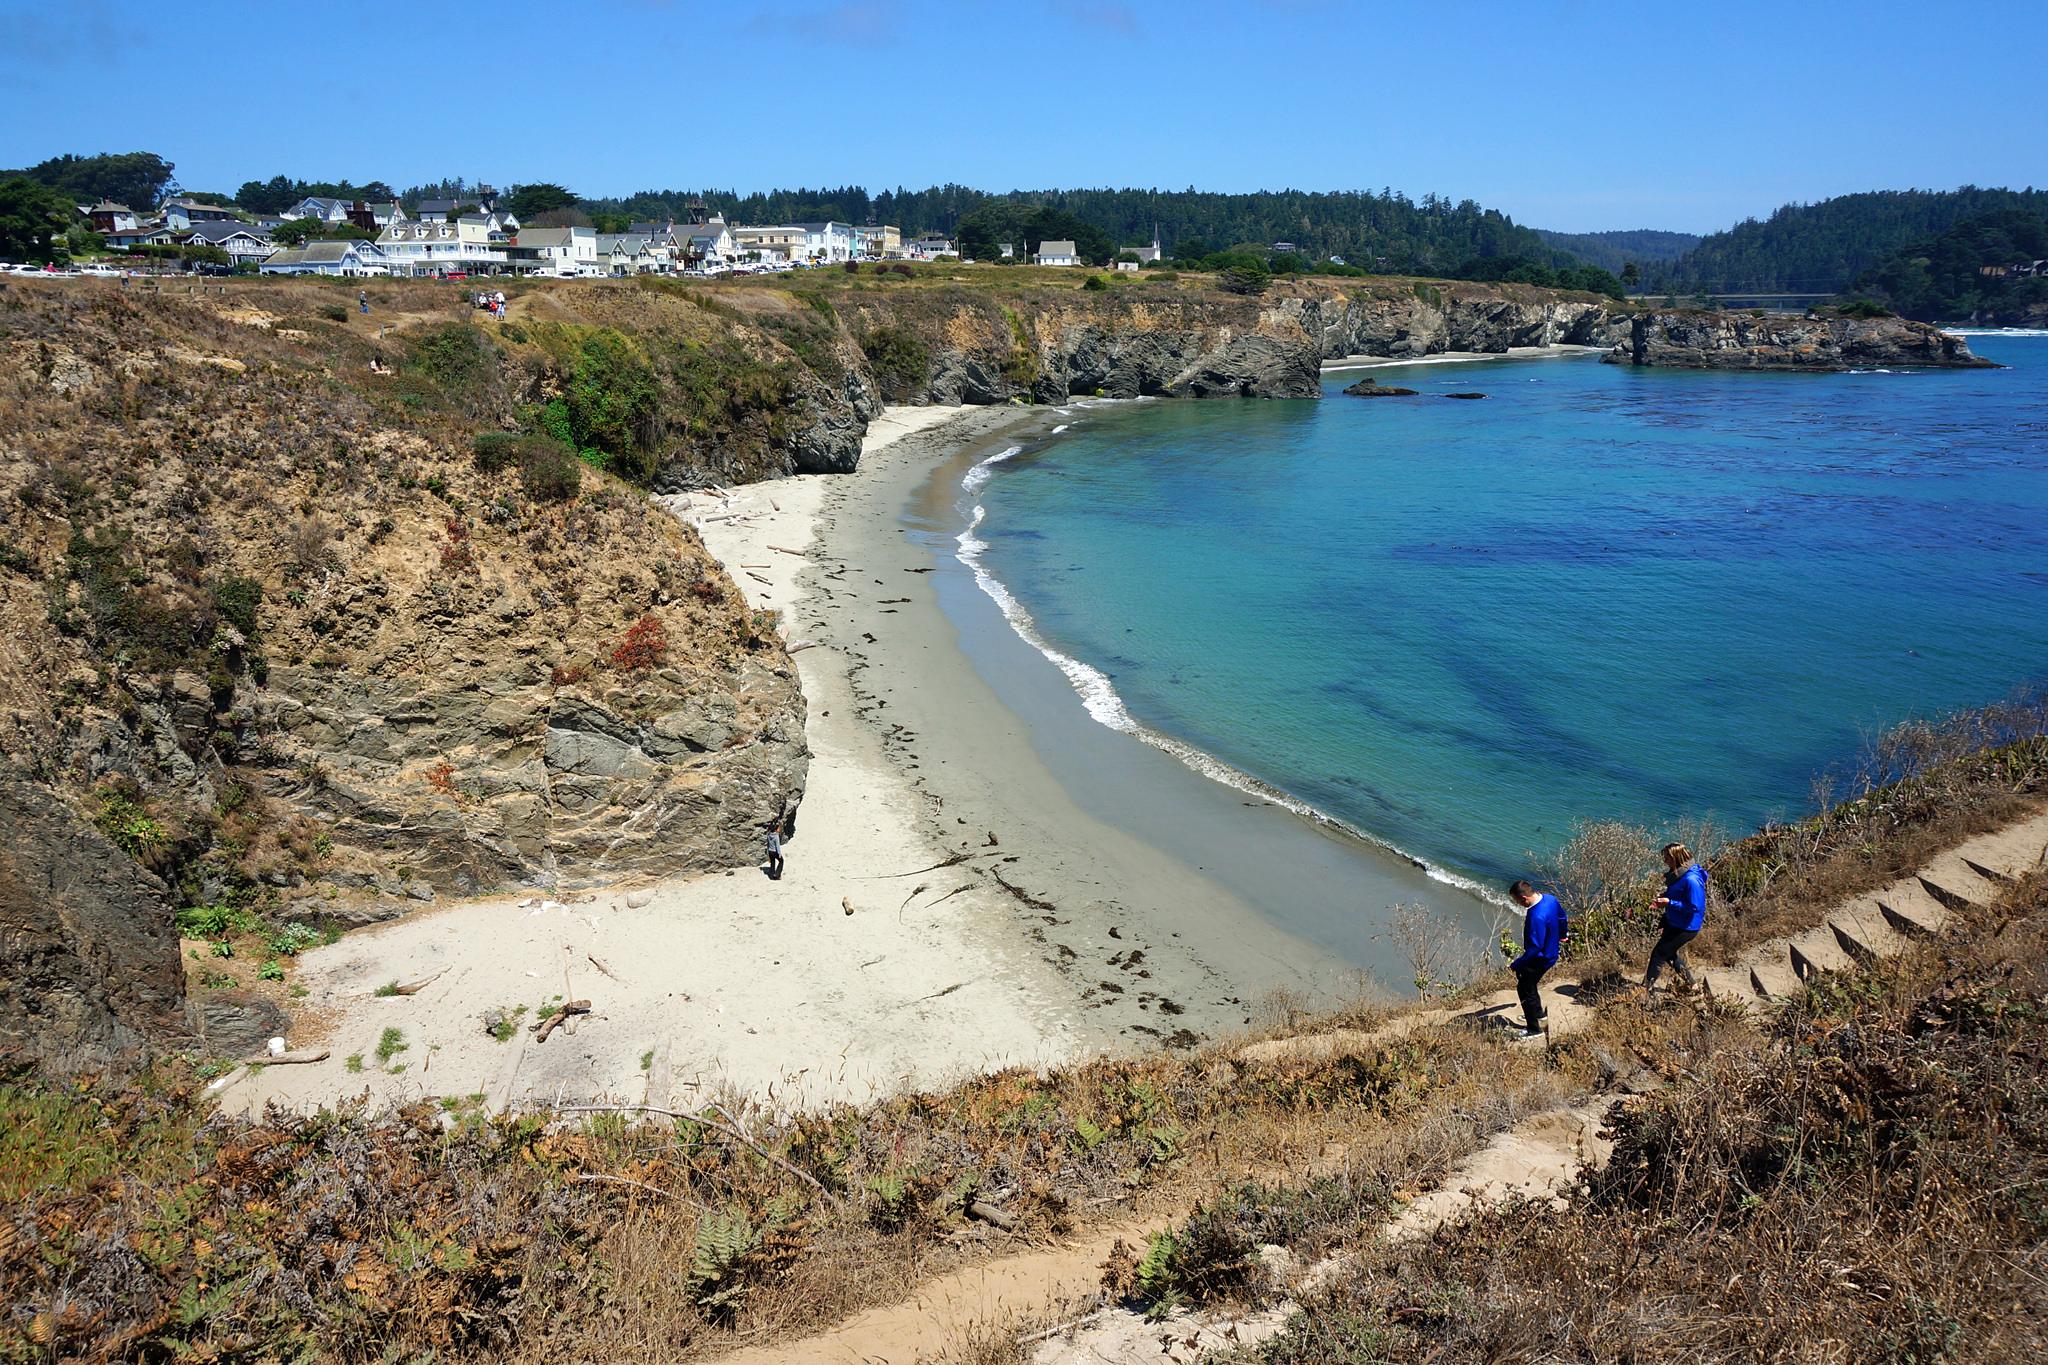 Beautiful Northern California Drop Top: Mendocino Is Northern California's Most Naturally